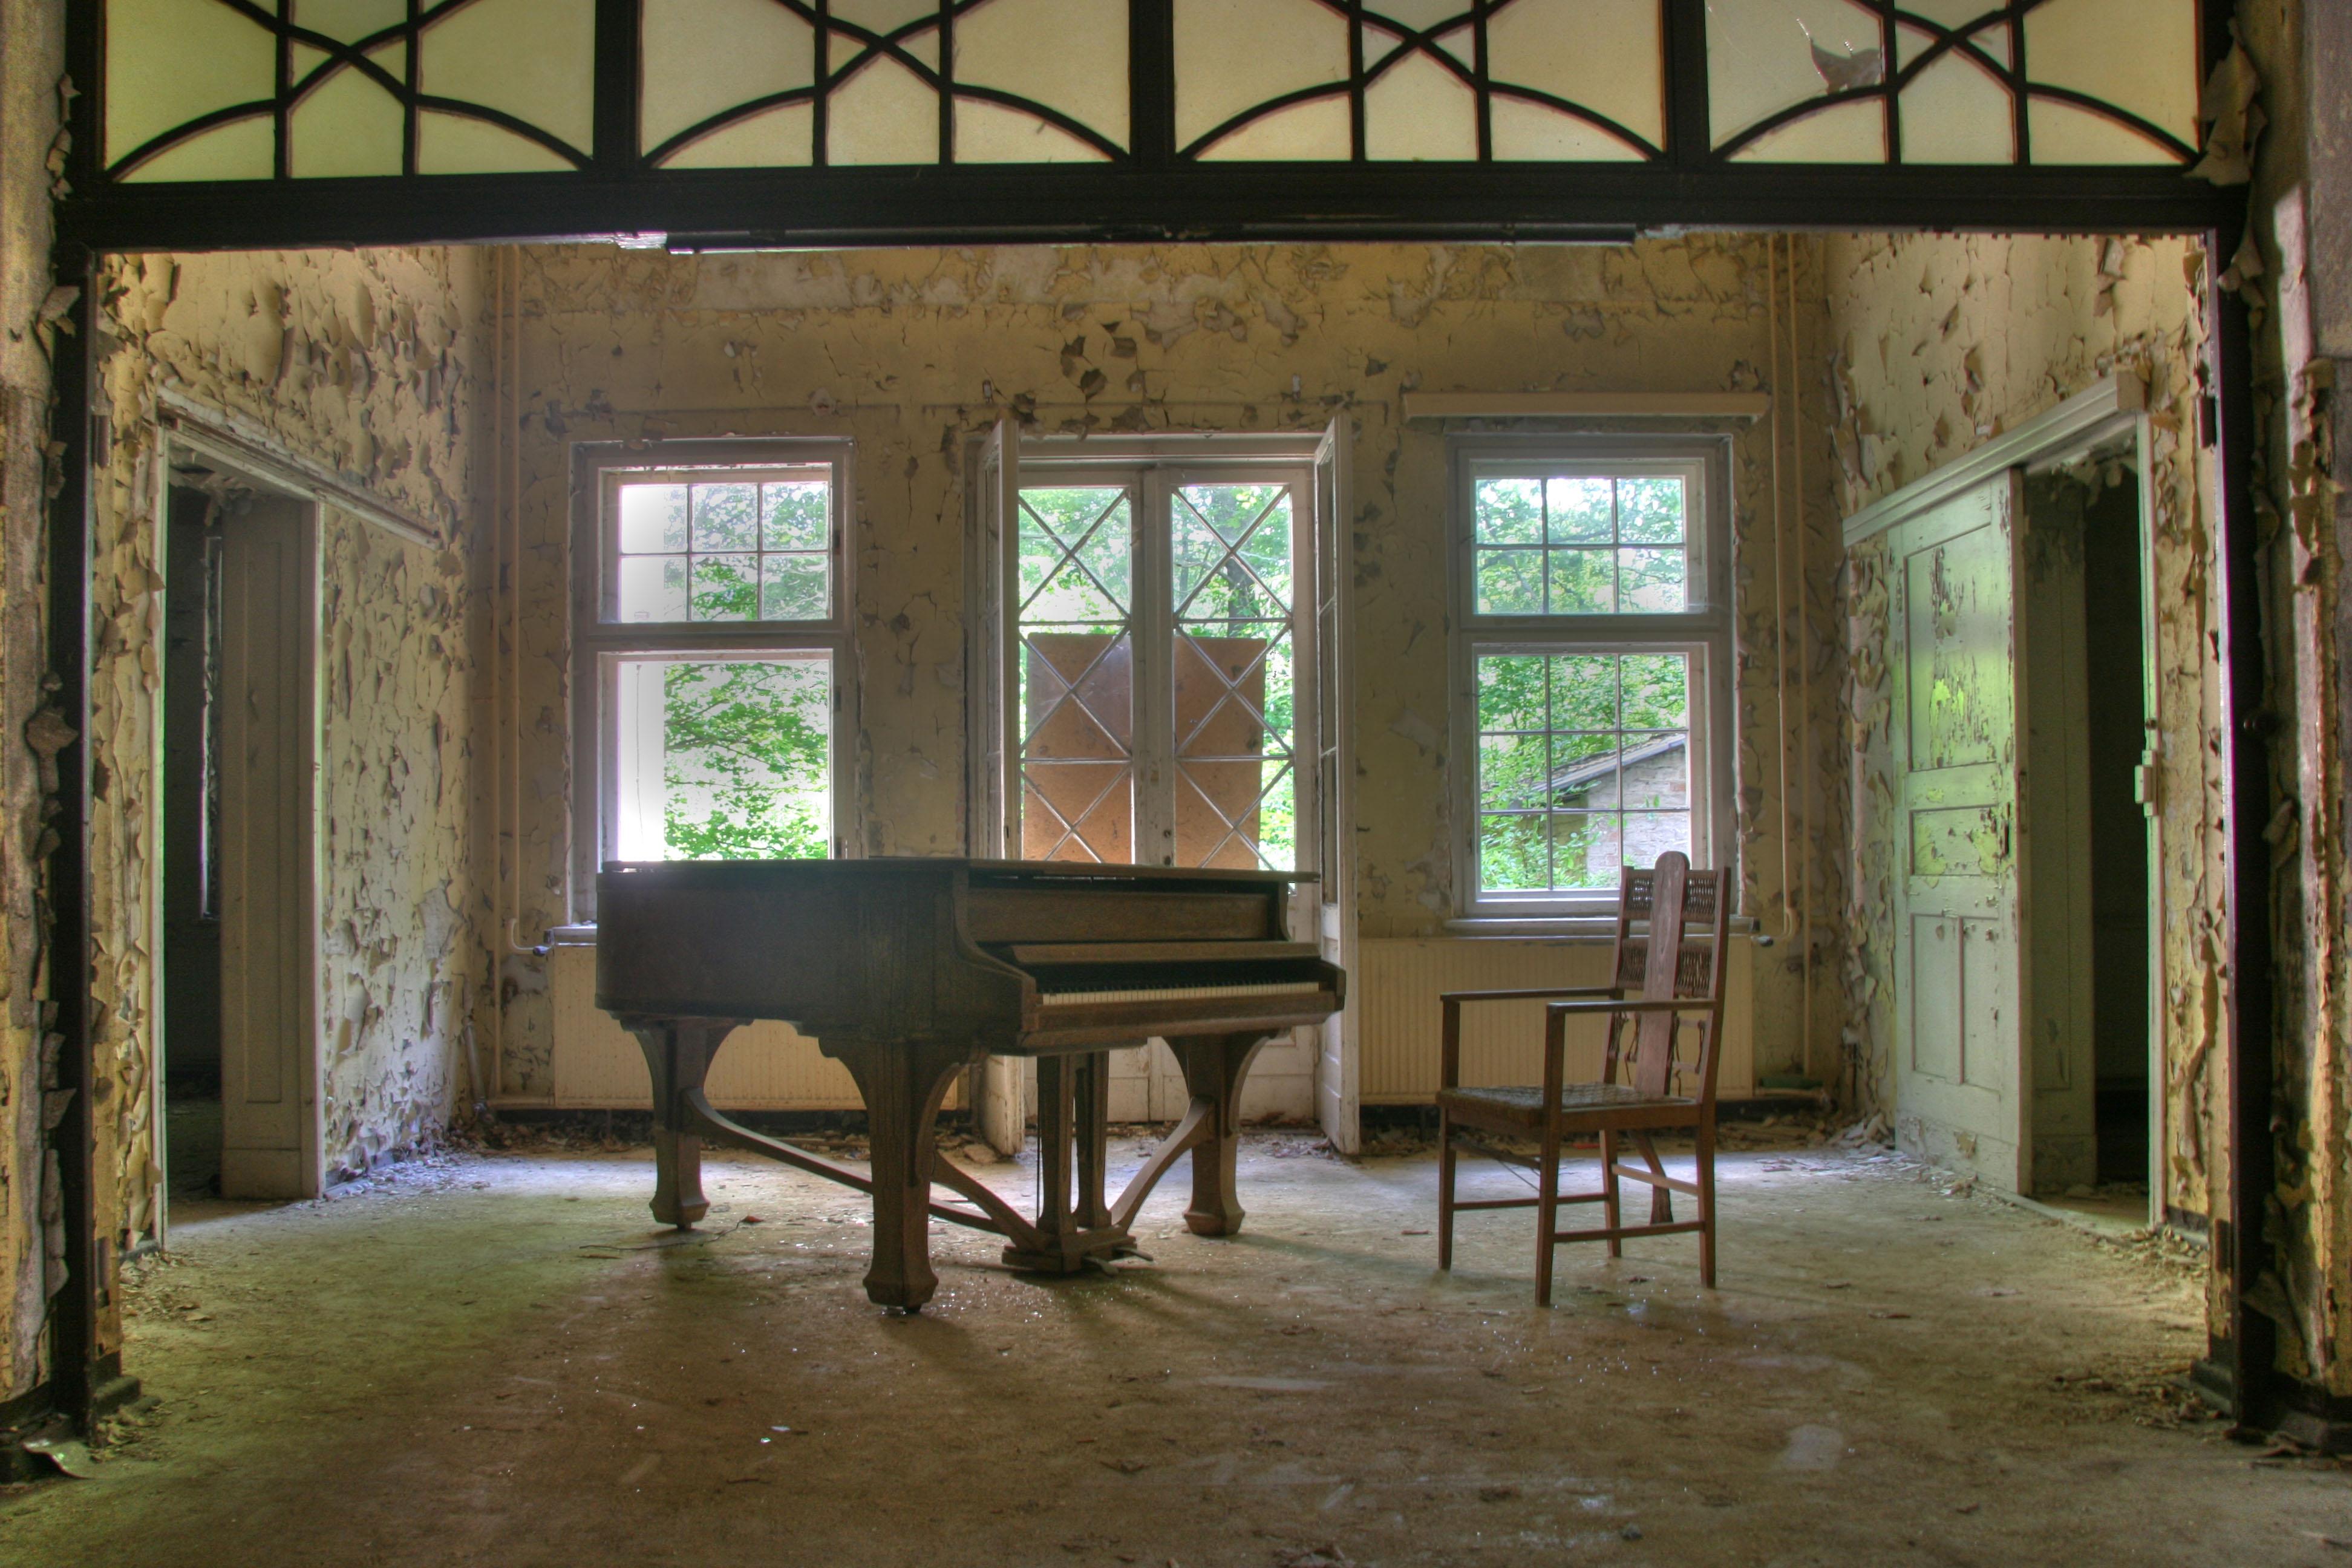 sanatorium e abandoned tuberculosis hospital andberlin. Black Bedroom Furniture Sets. Home Design Ideas